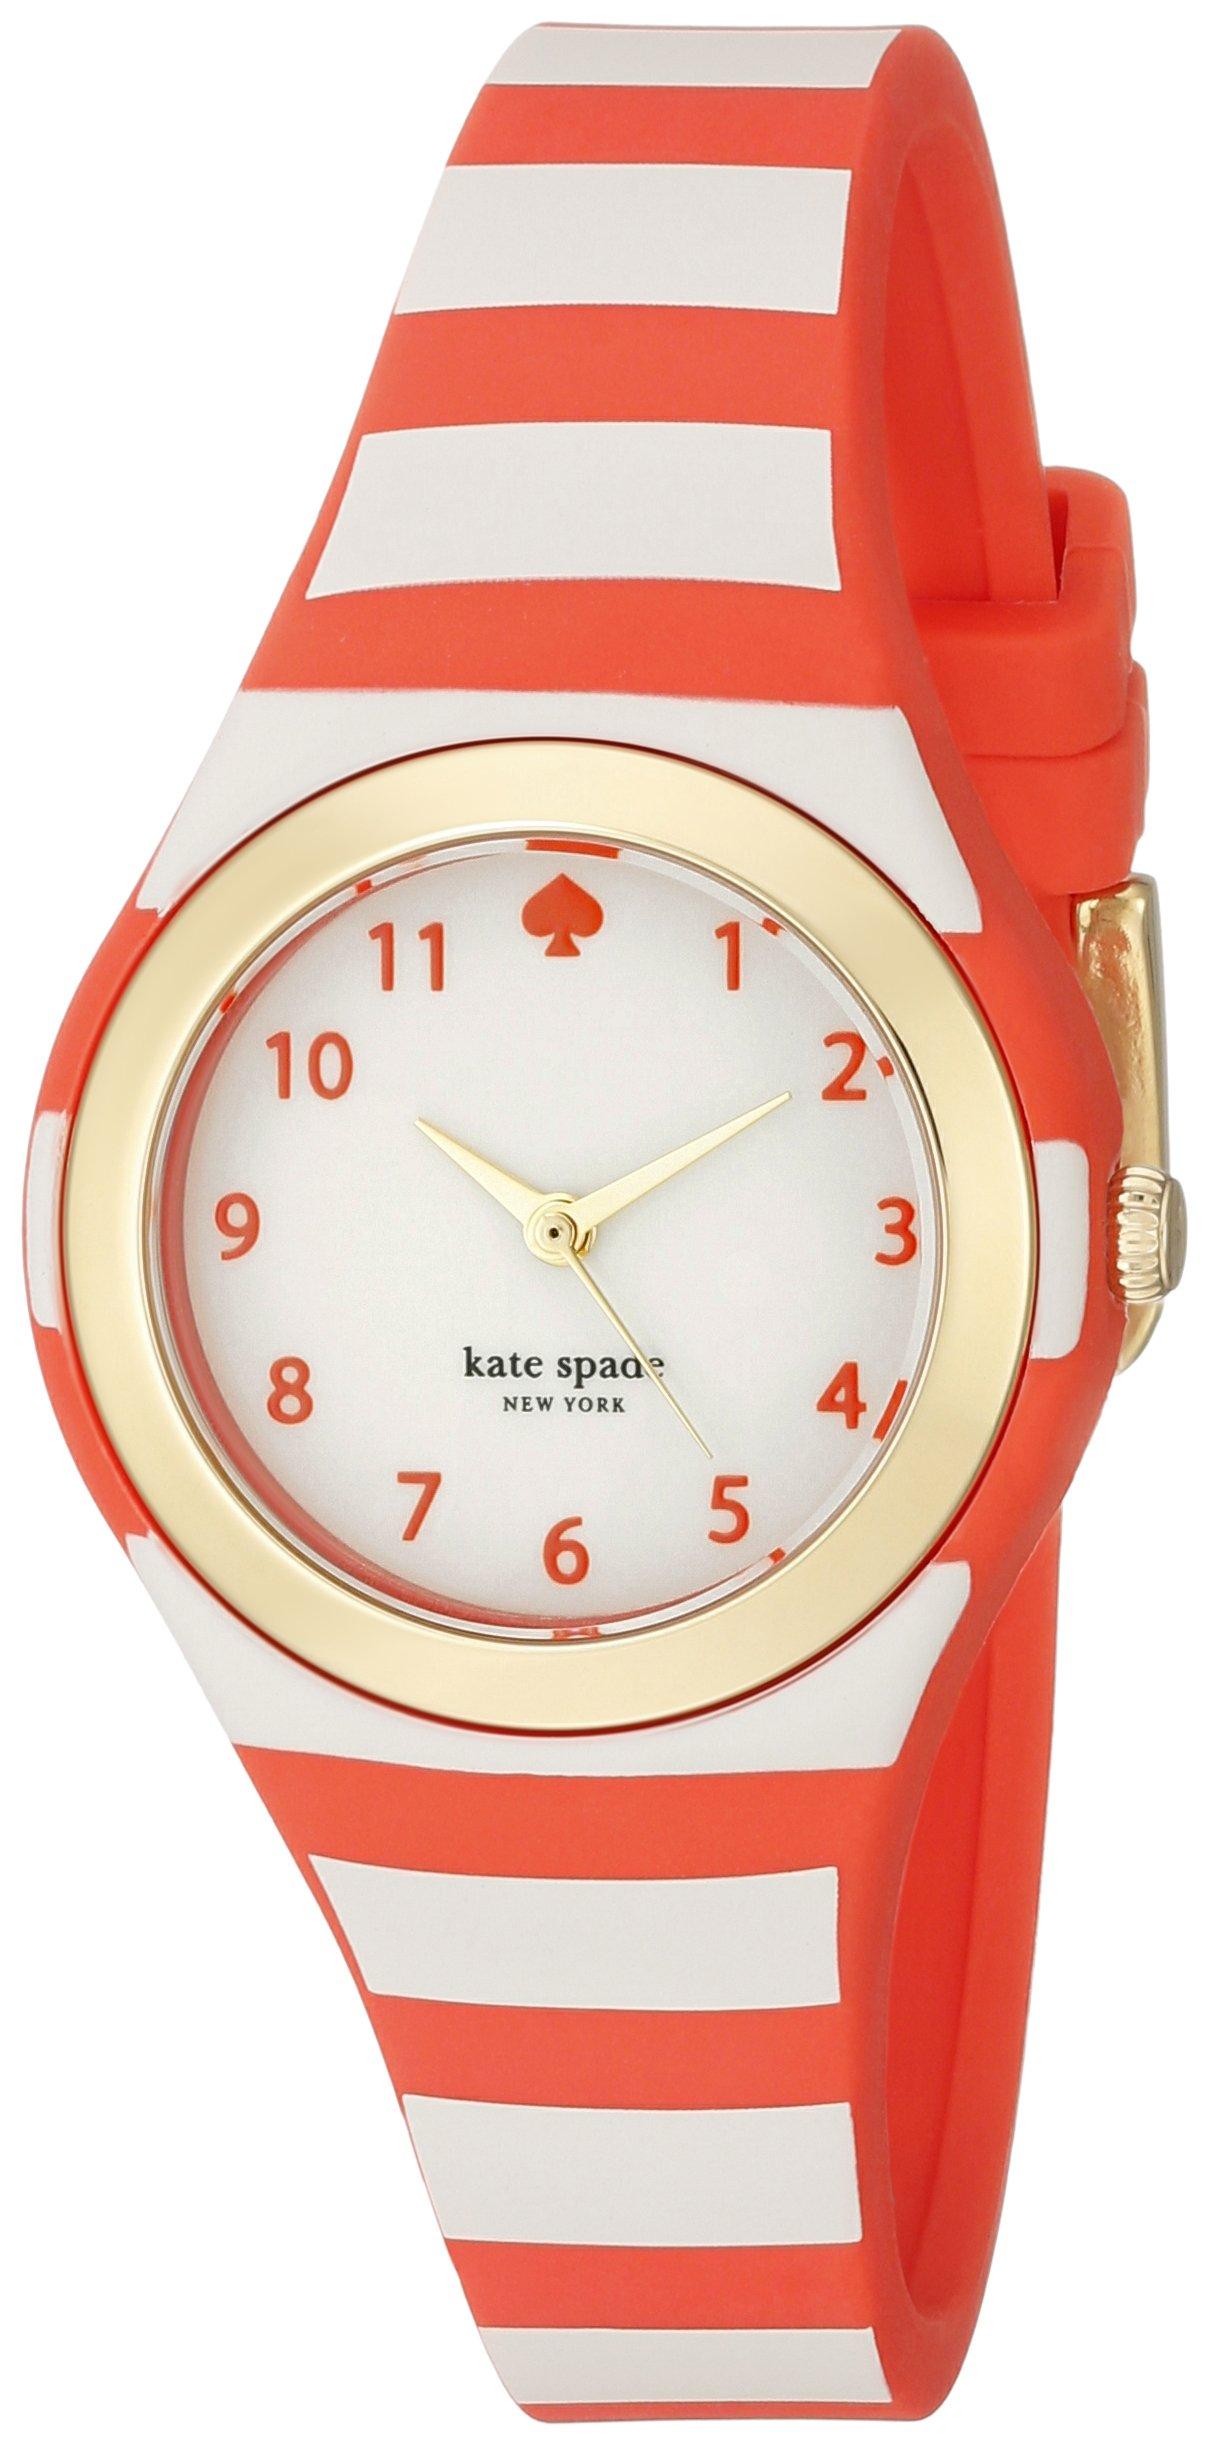 Kate Spade New York Women's 1YRU0771 Rumsey Analog Display Japanese Quartz Multi-Color Watch